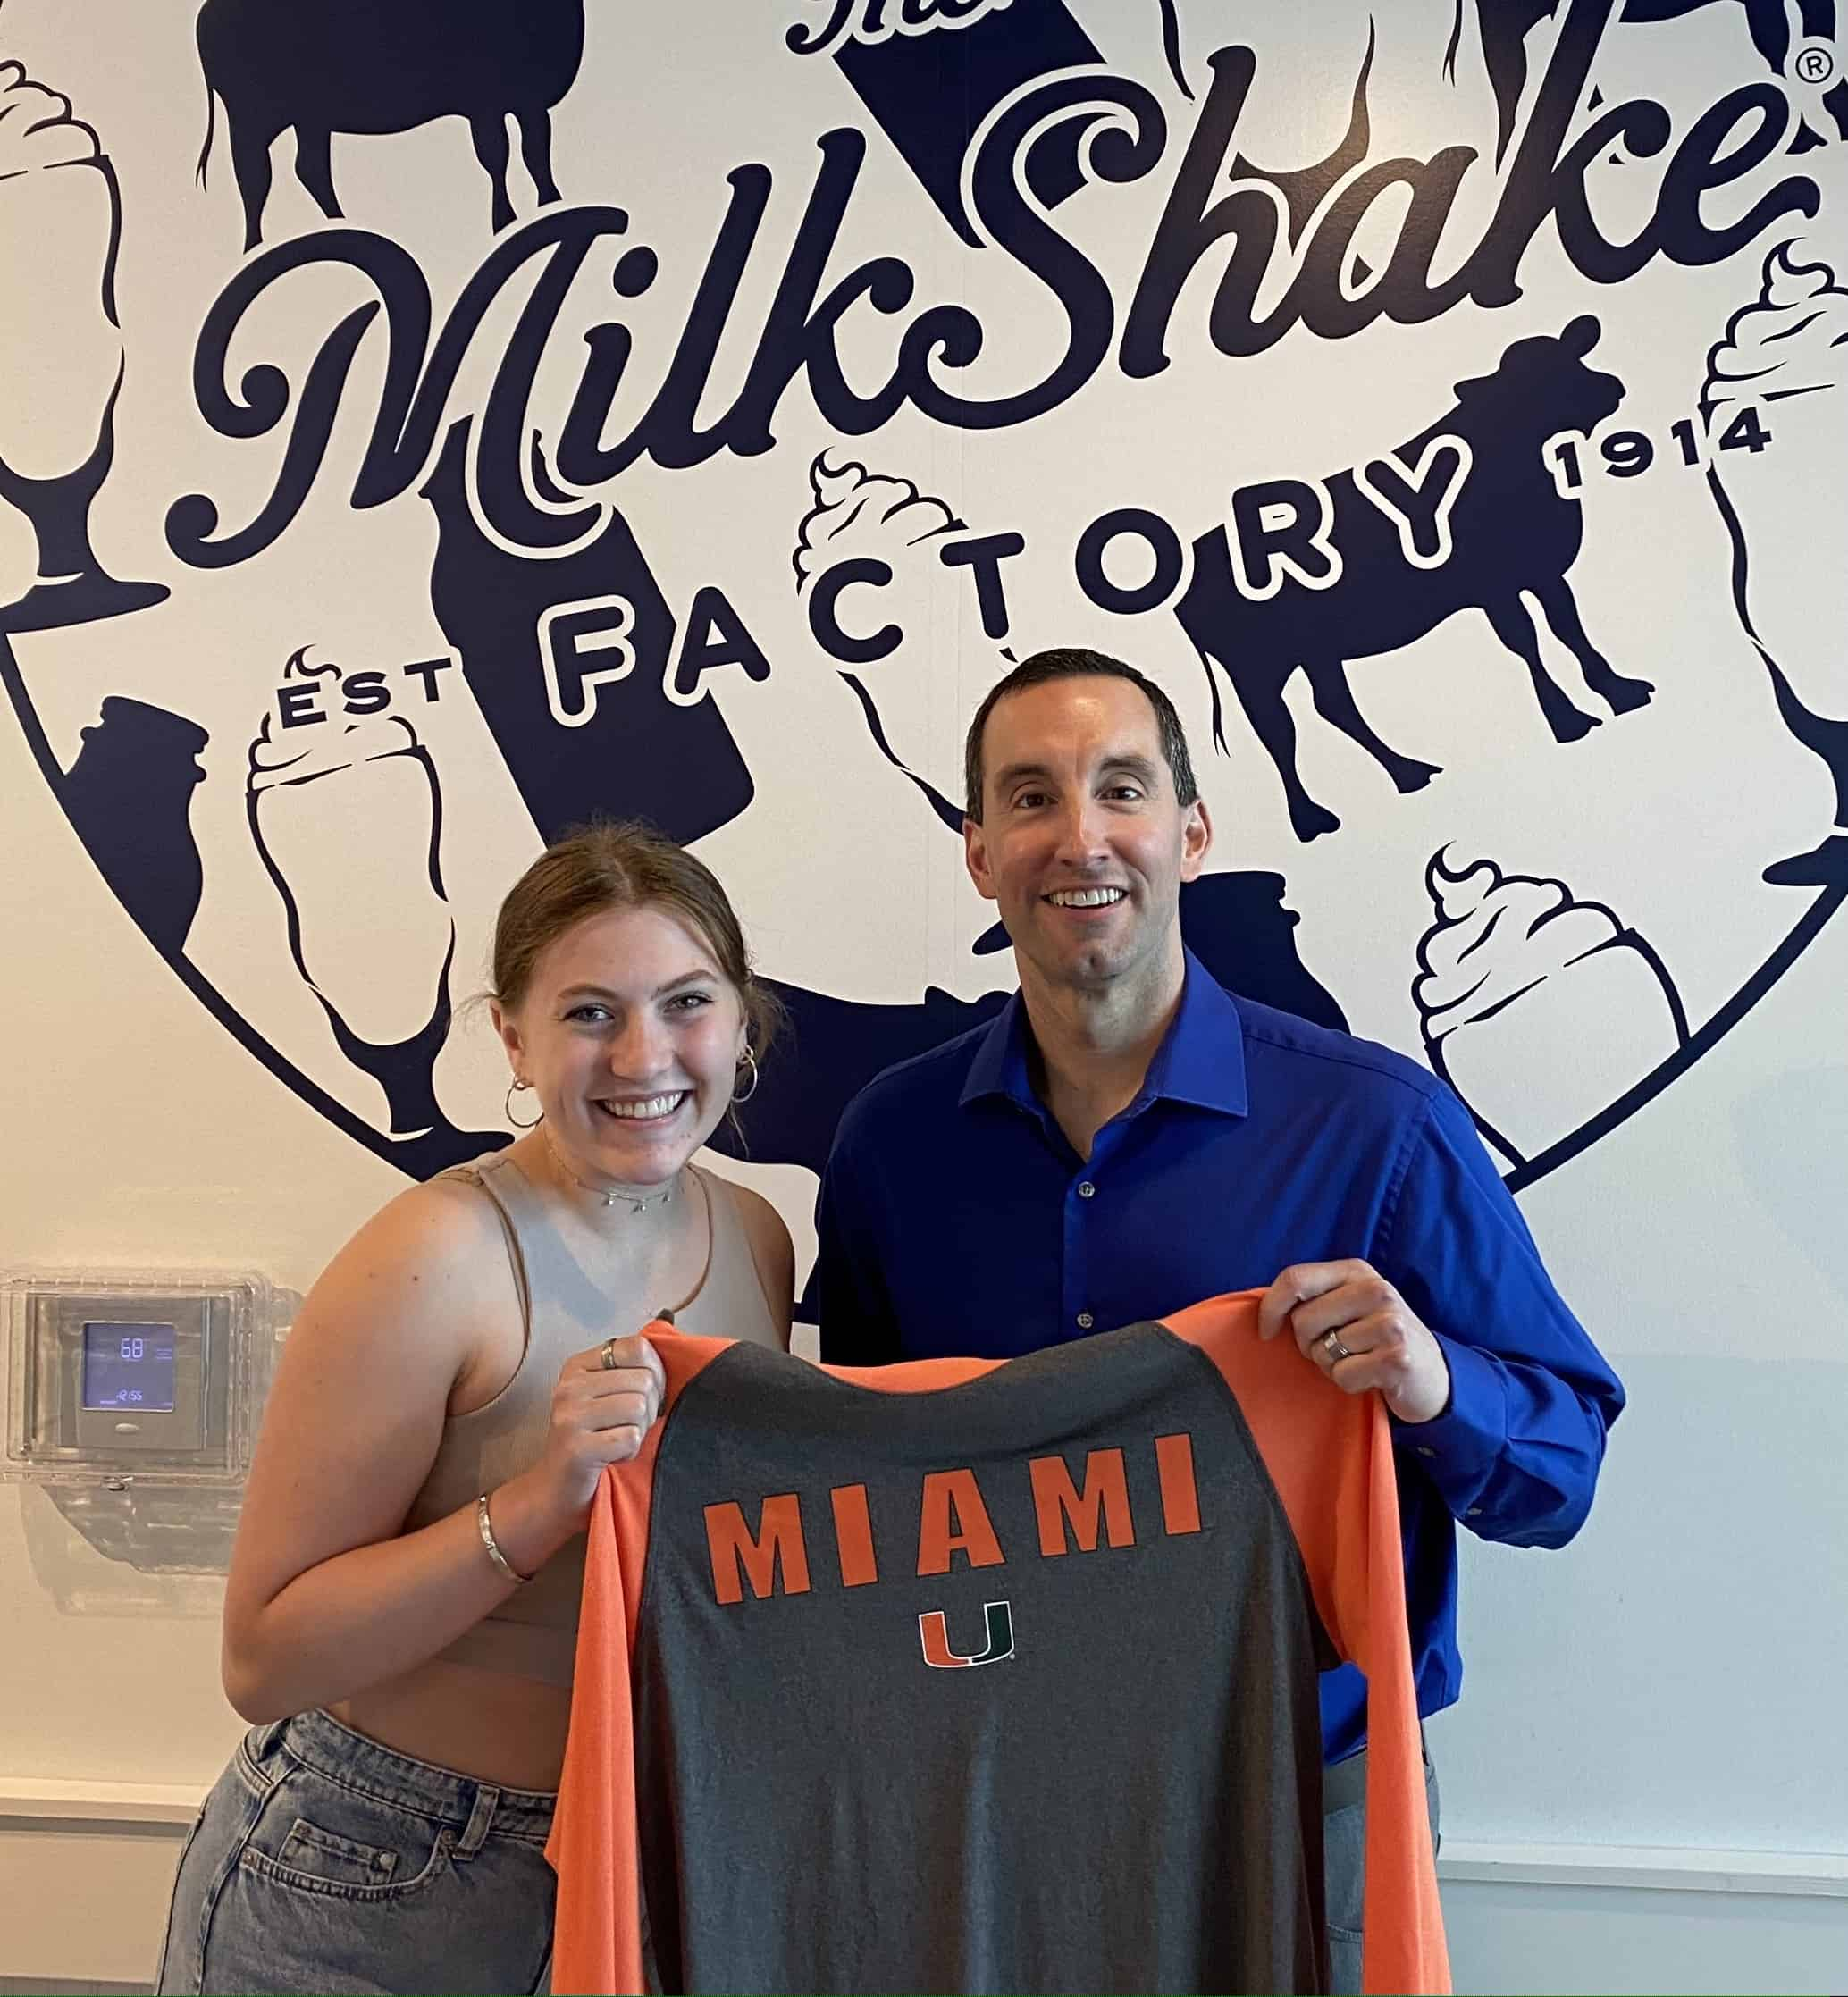 Podcasting, Milkshakes, and the University of Miami